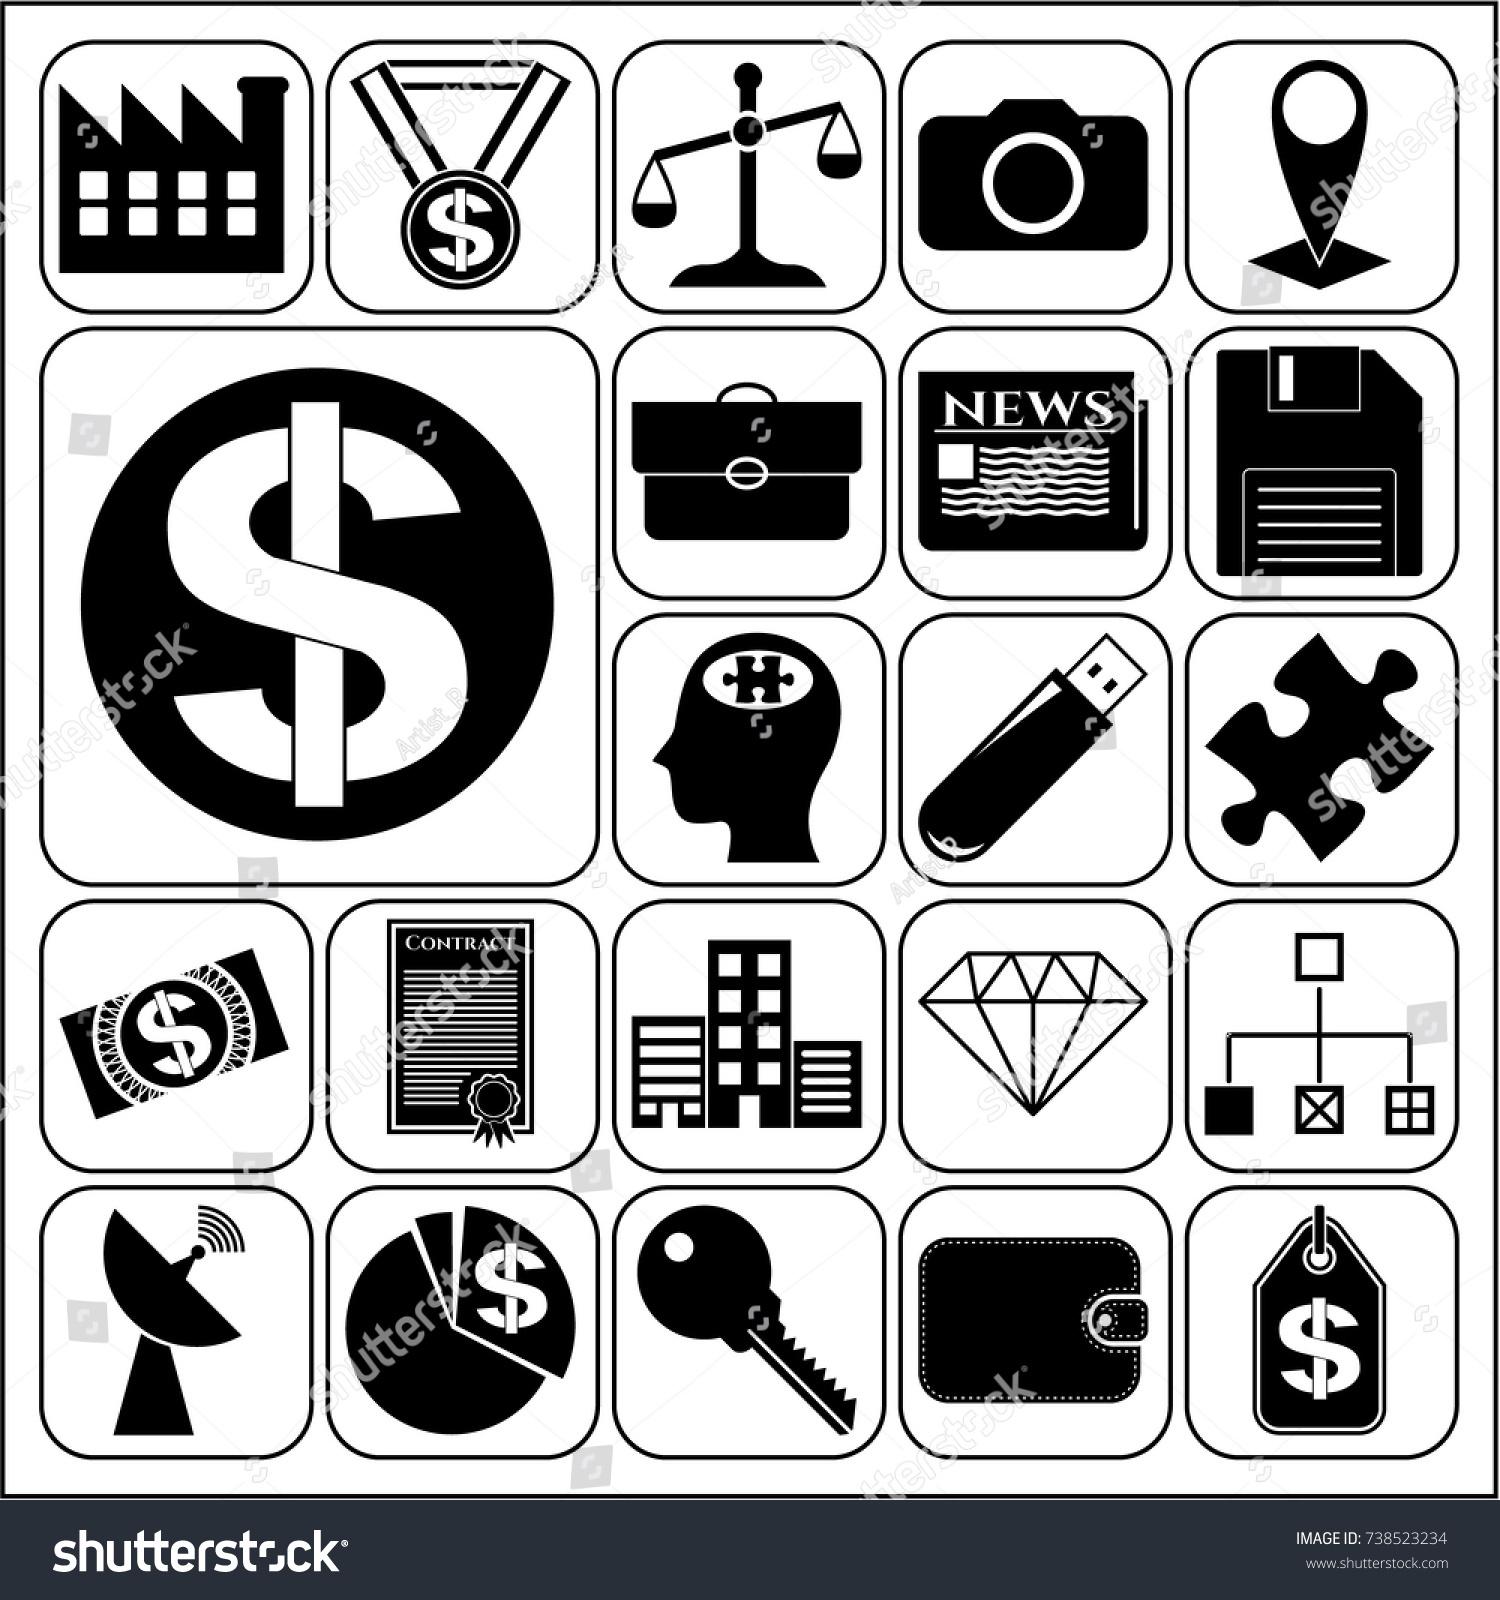 Set 22 Business High Quality Symbols Stock Vector 738523234